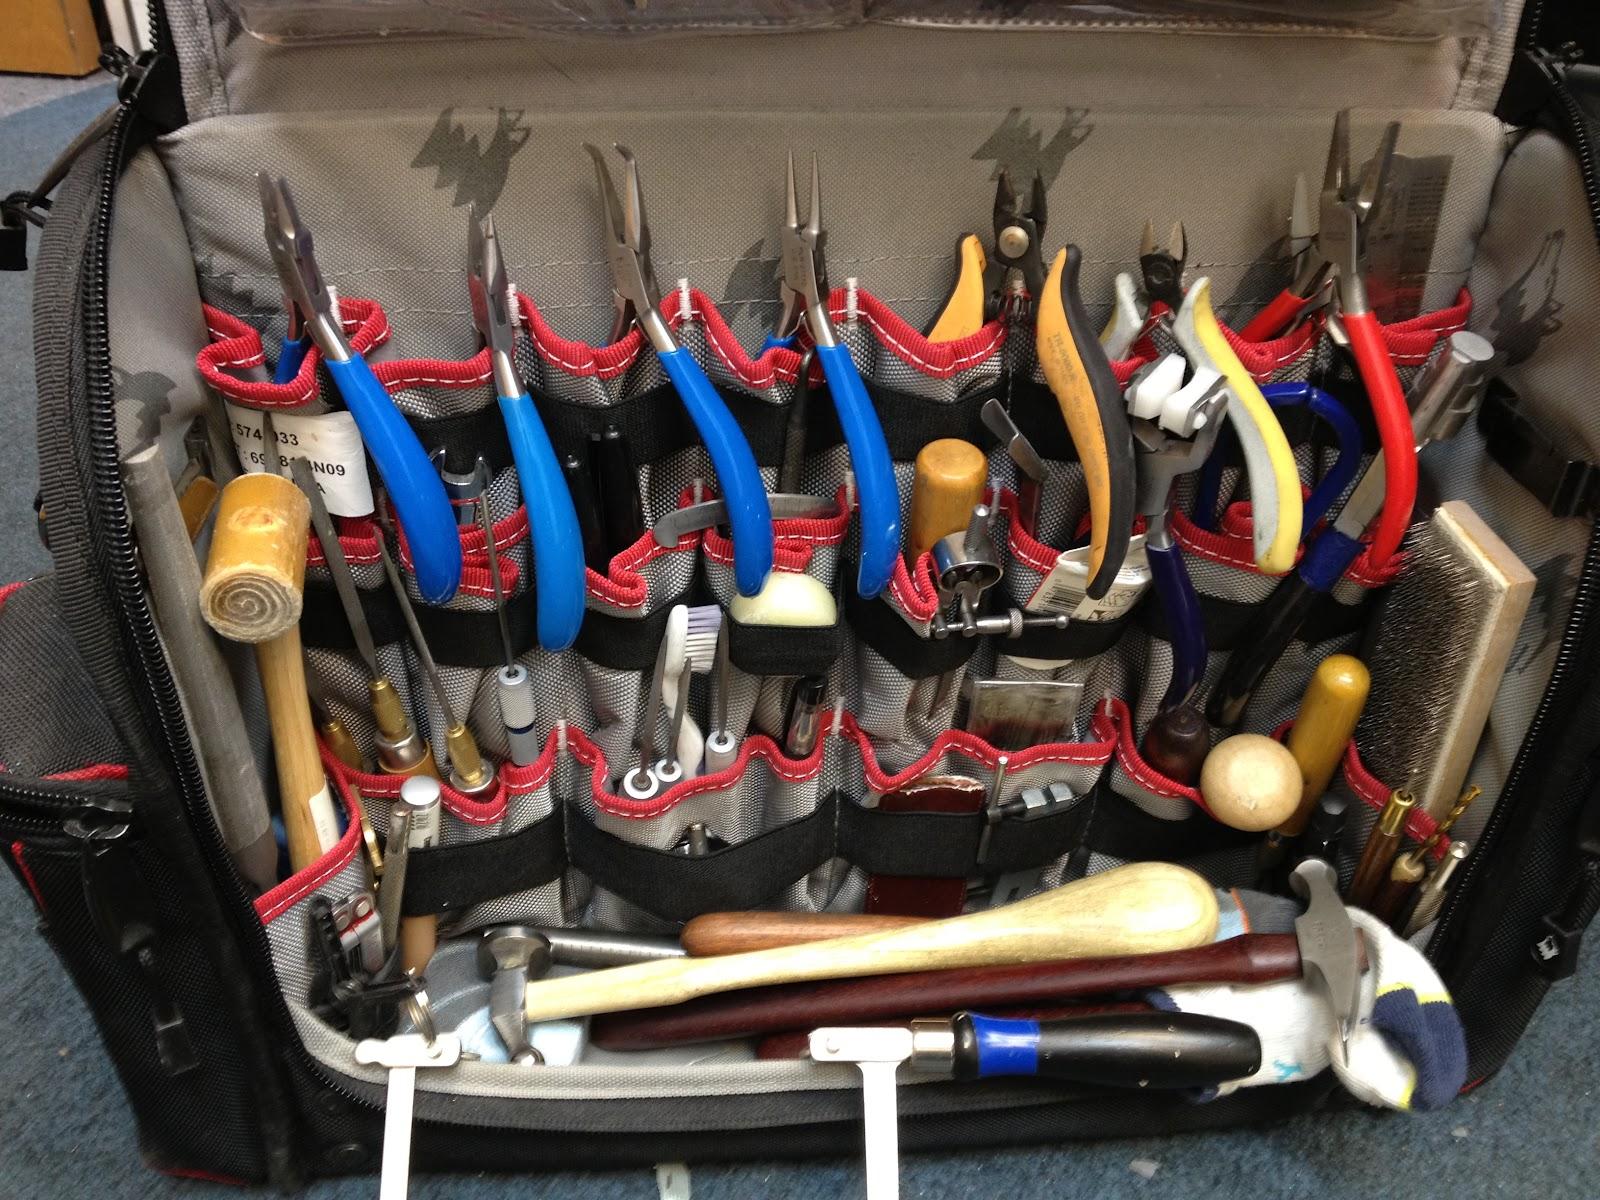 Home Tool Box Setup: Metal Studio Workbook: Your Tools. Anywhere. Anytime With